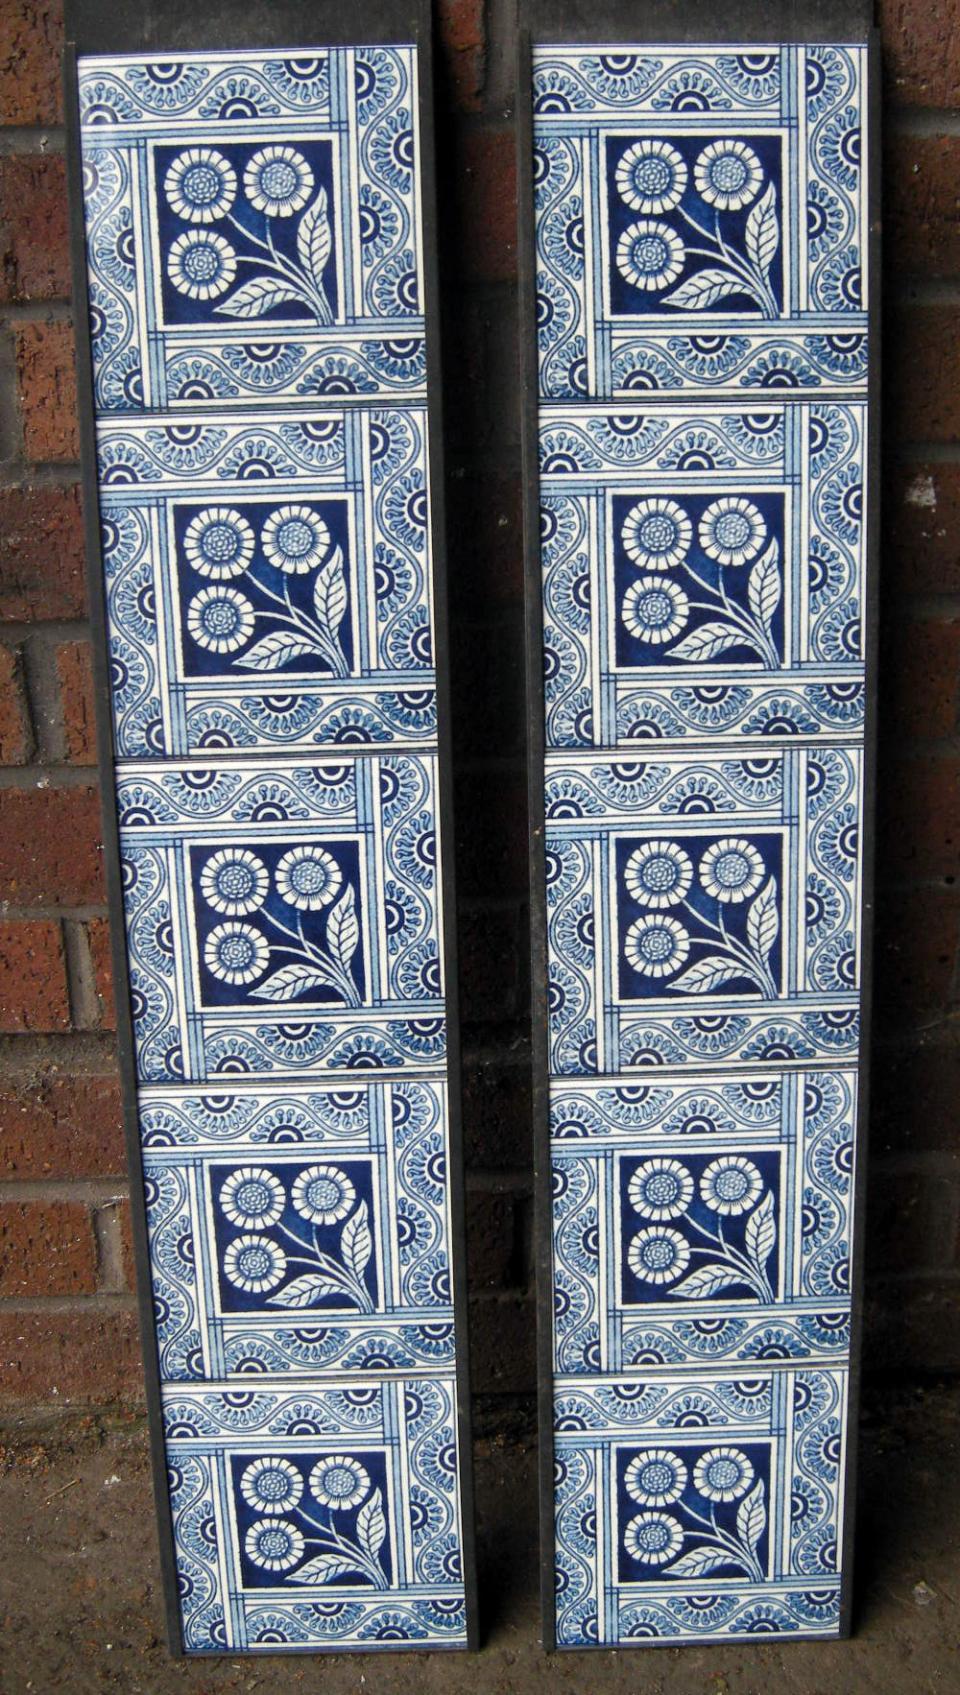 Aesthetic Movement tile Blue Daisy Fireplace Tile Set